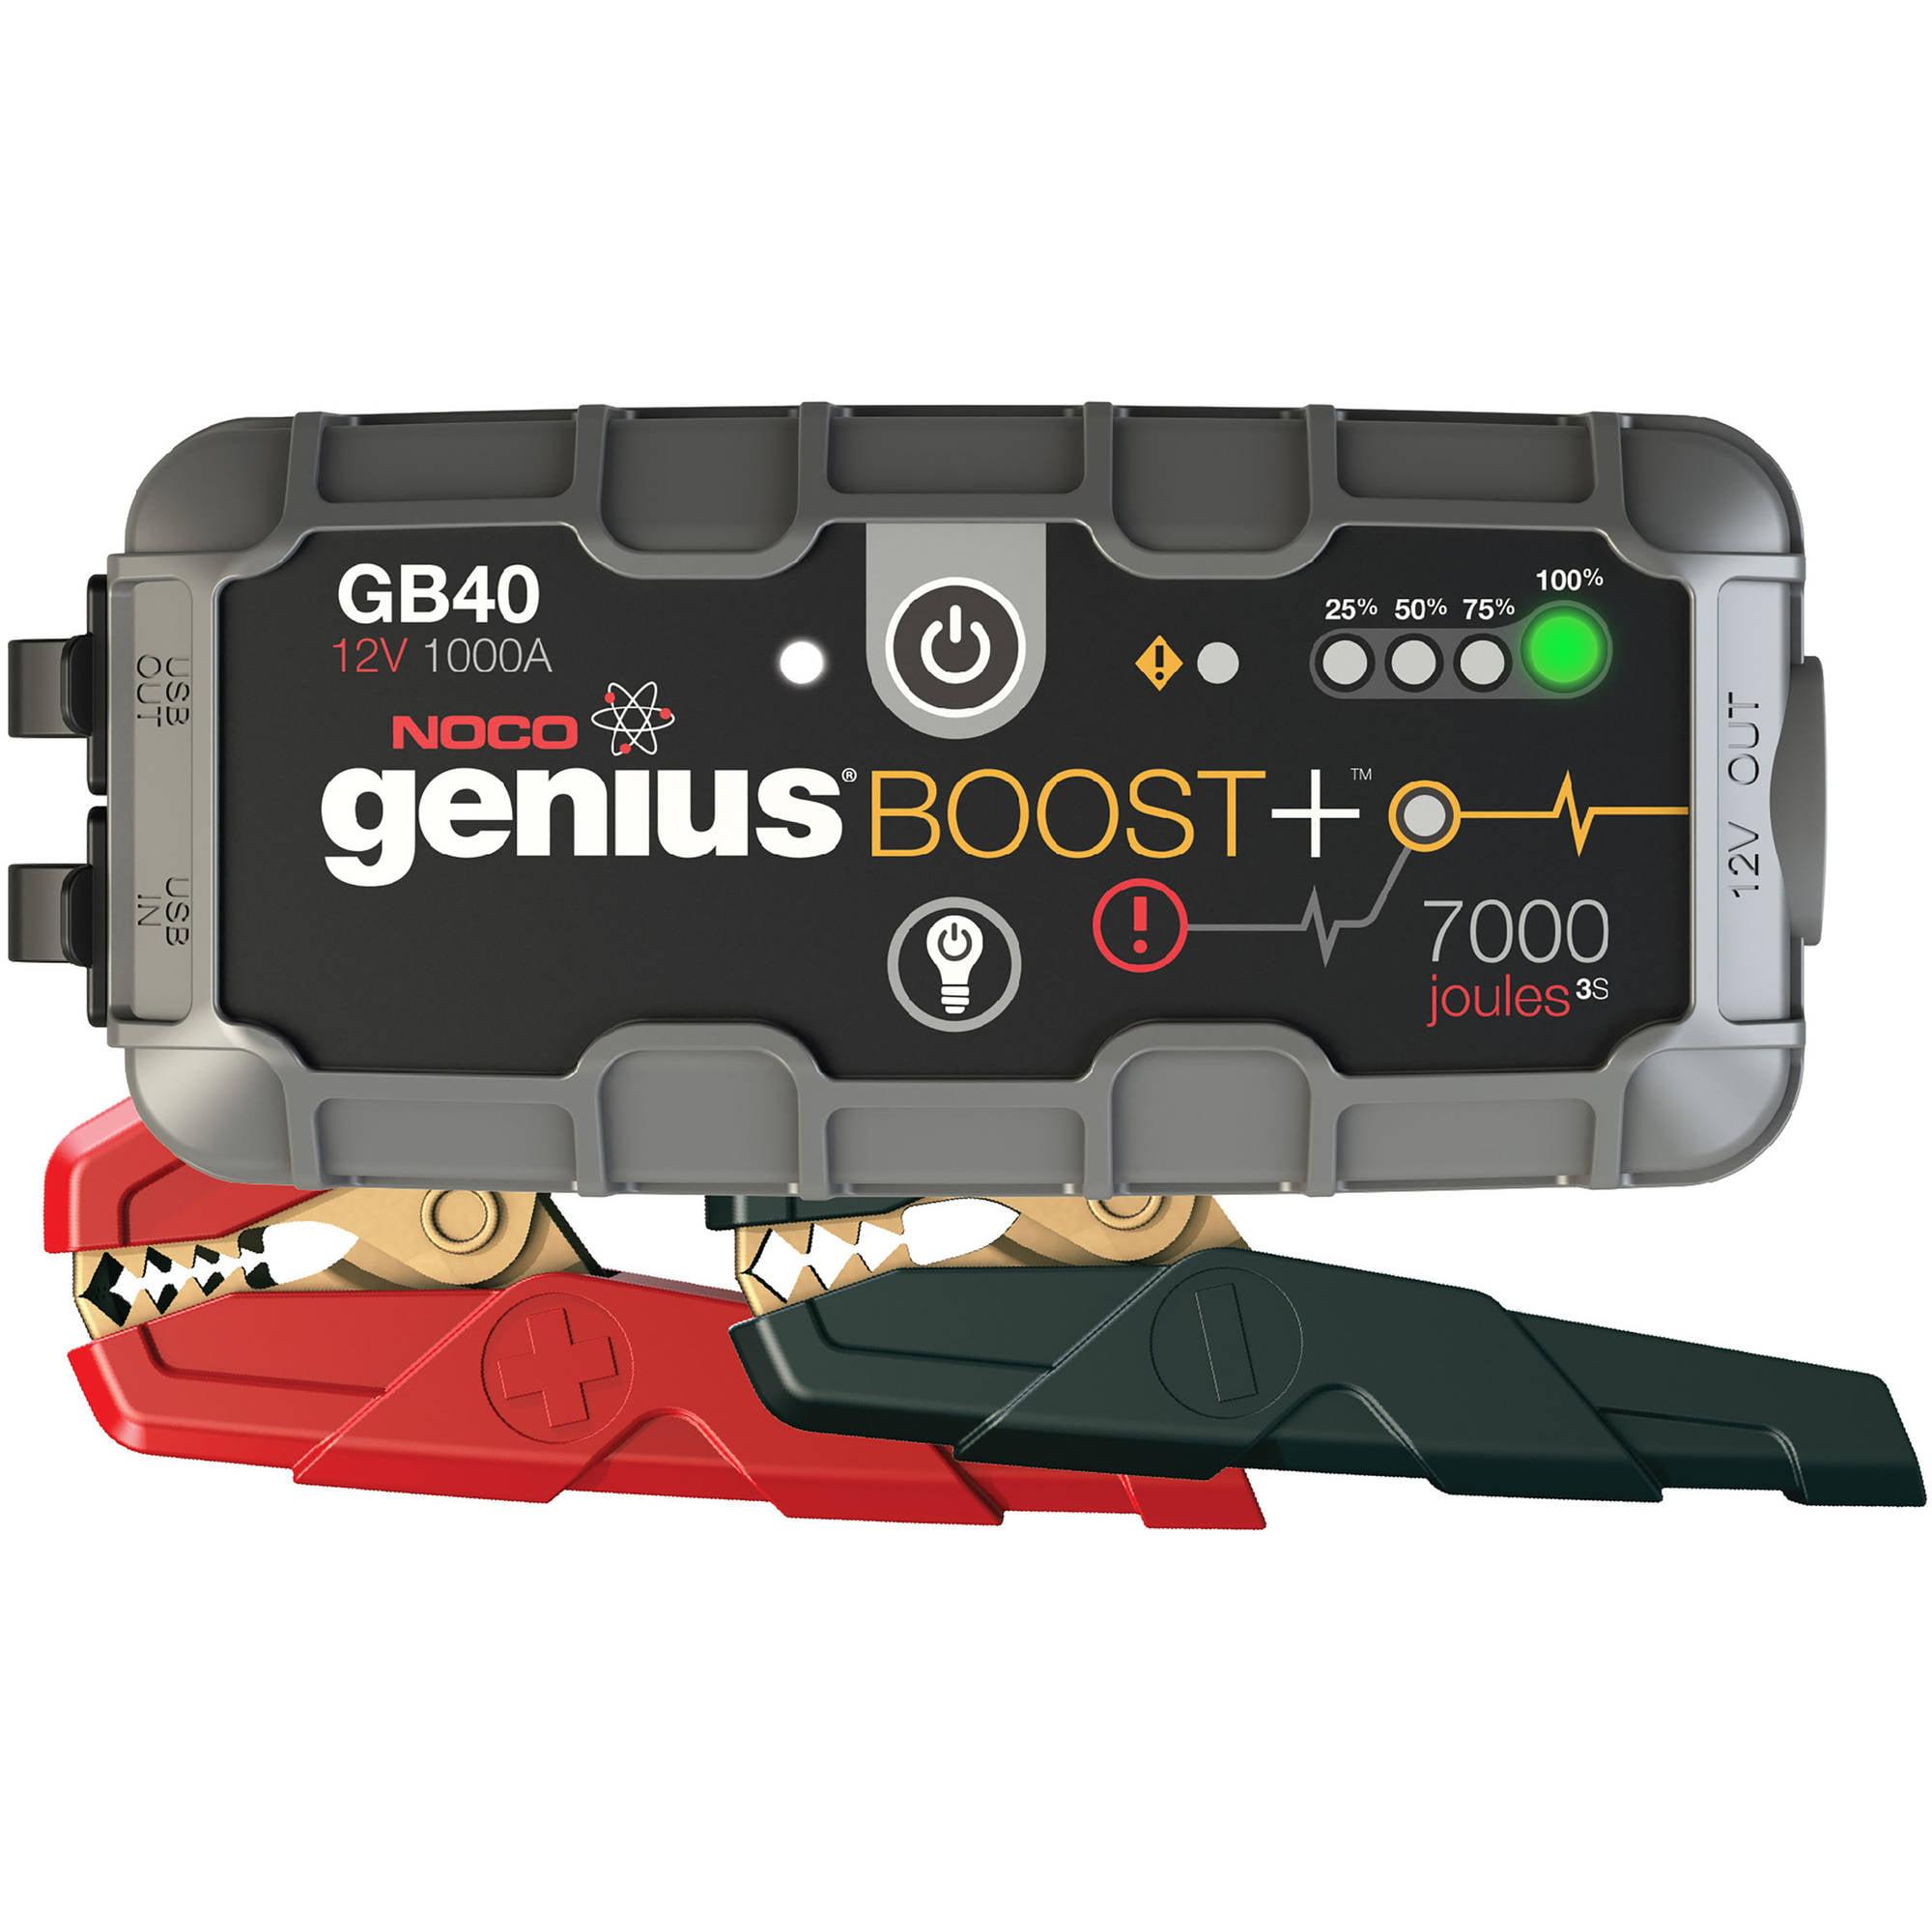 NOCO GB40 Genius Boost Plus 1,000A Jump Starter by Noco